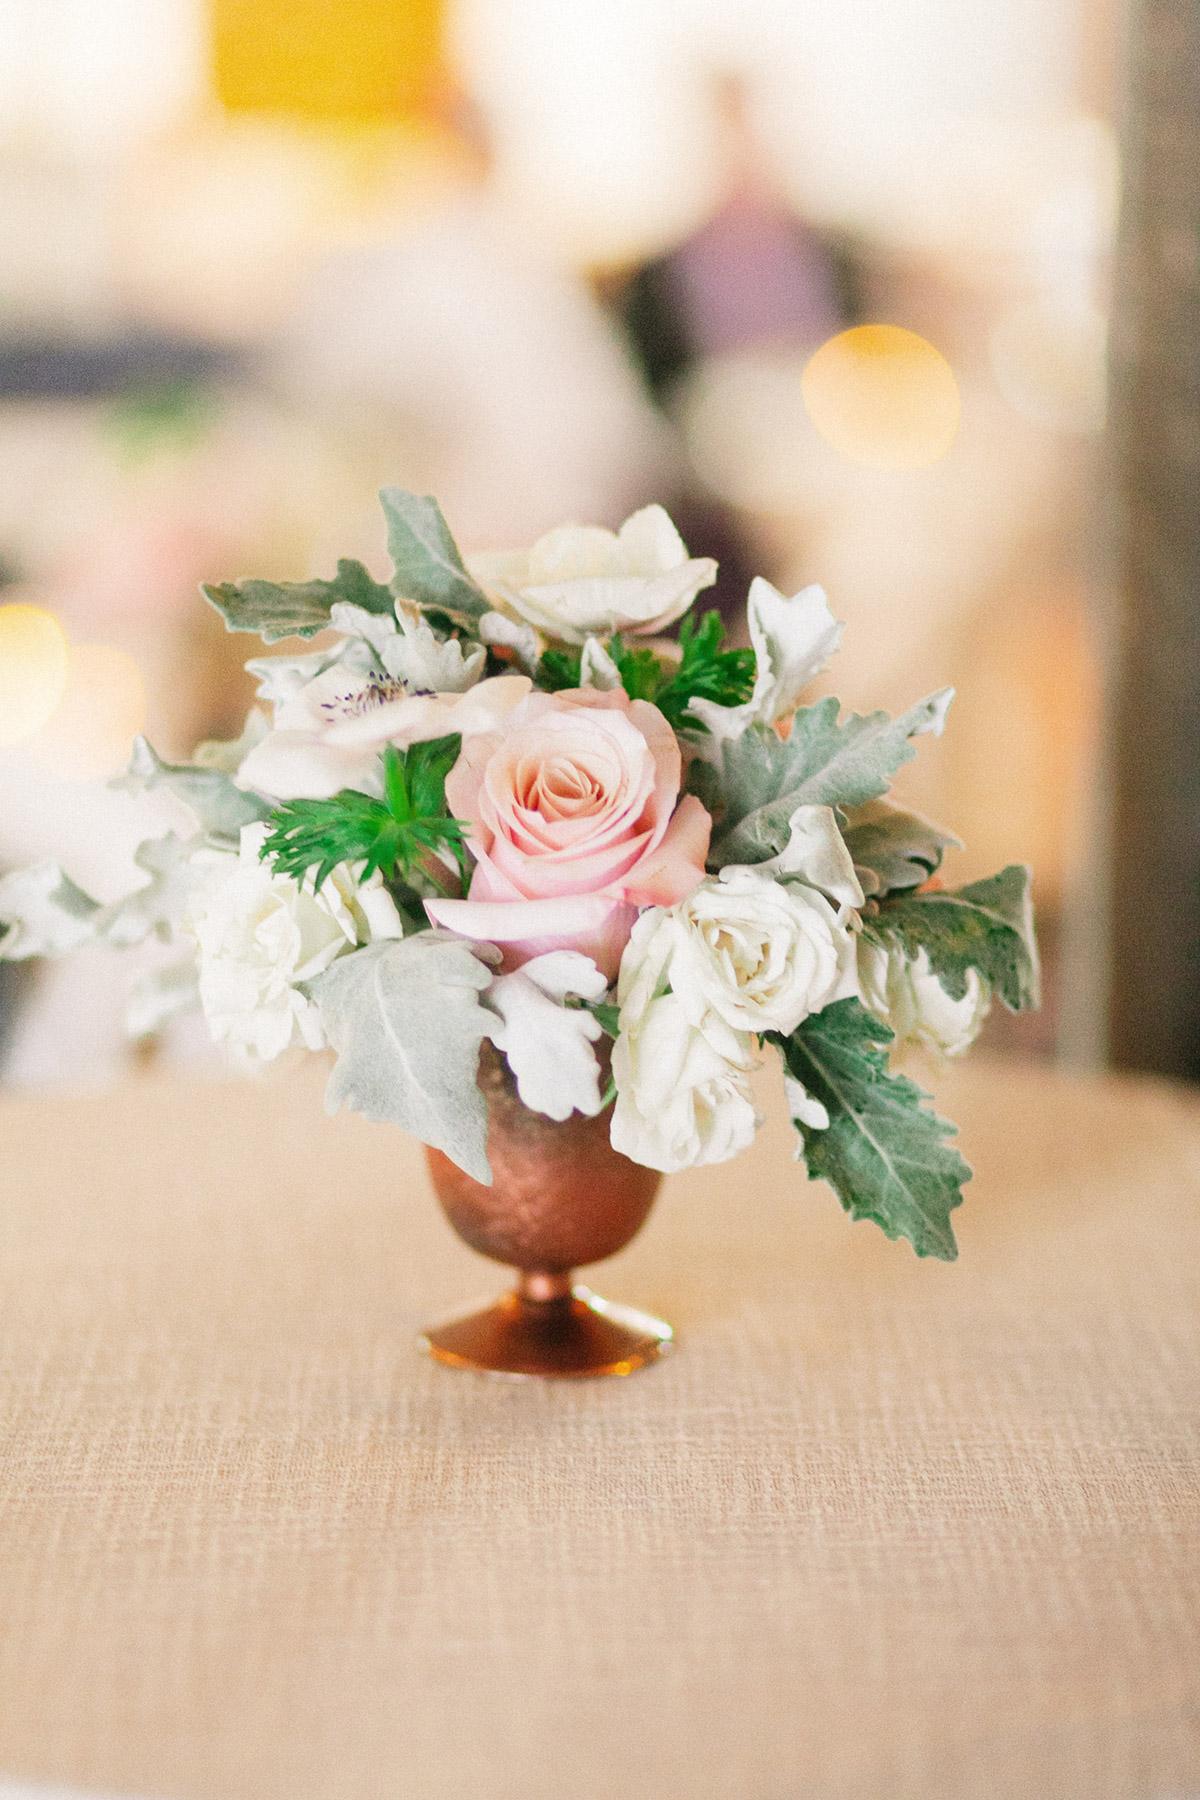 jennifer-xu-photography-vineyard-bride-swish-list-spice-factory-hamilton-wedding-38.jpg